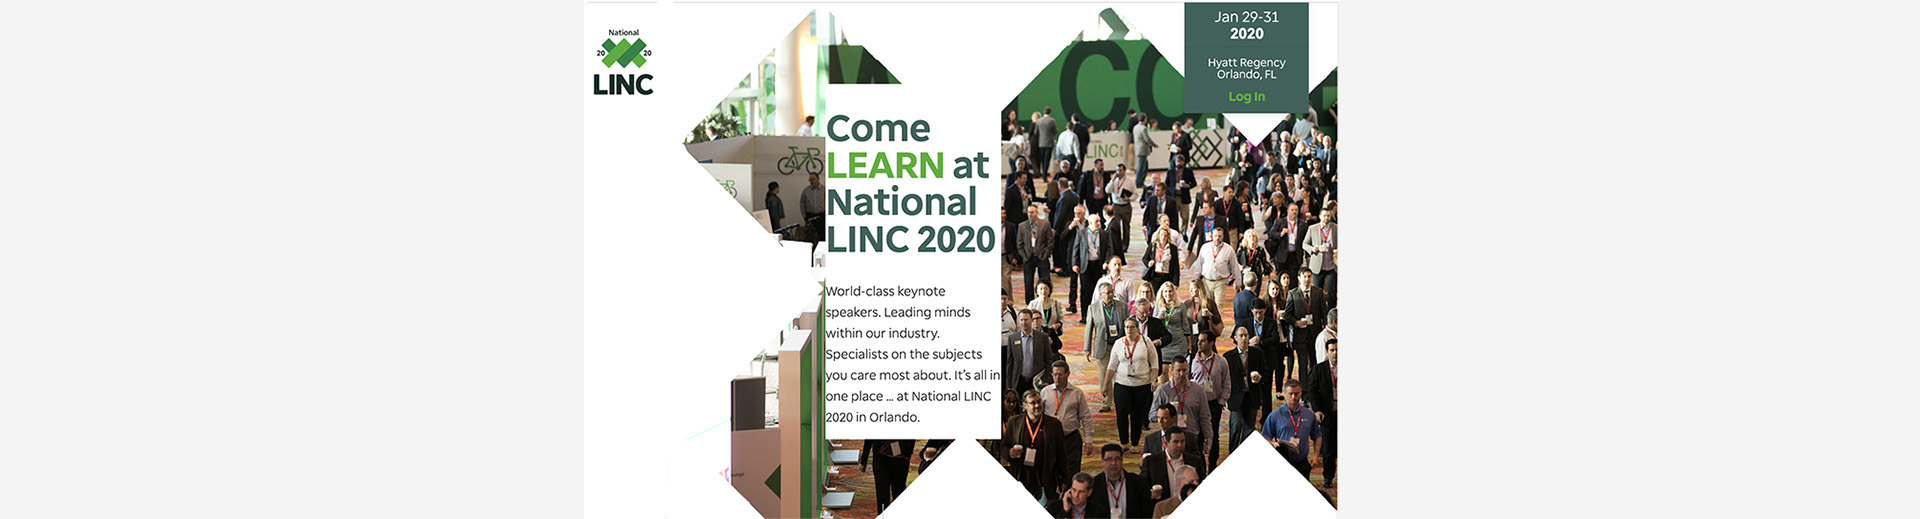 TD National LINC promo